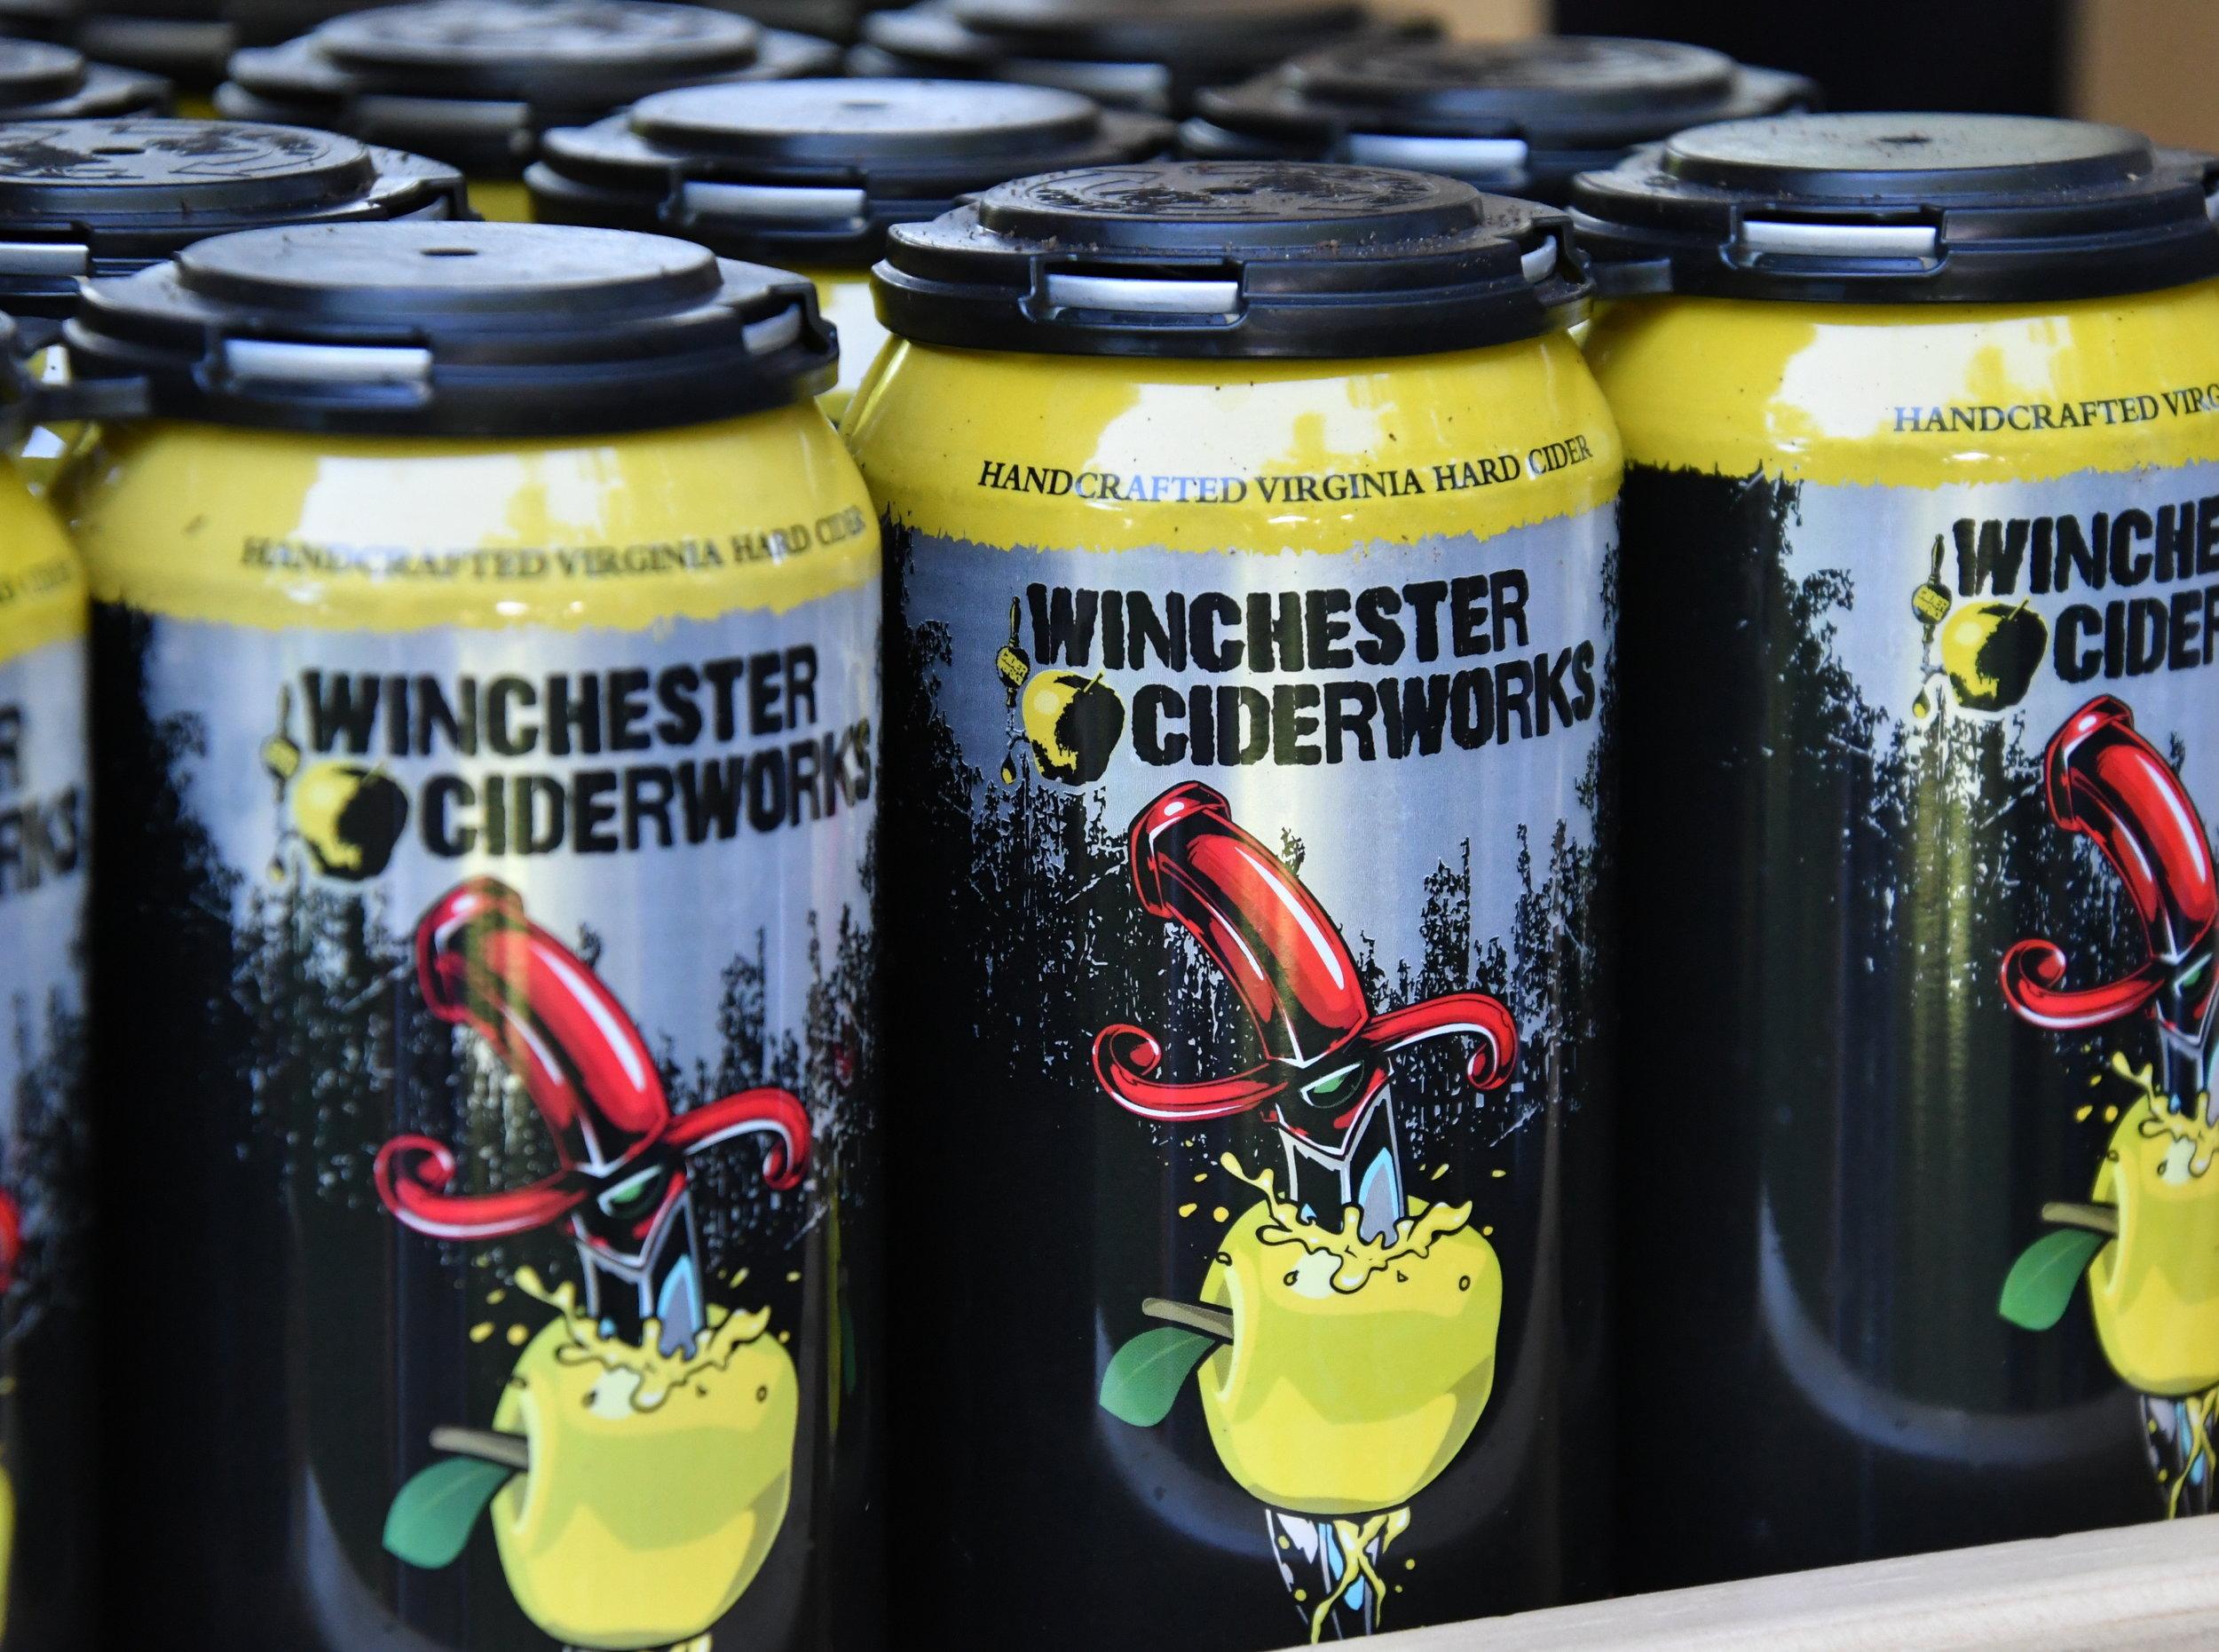 winchester cider works 2.jpg